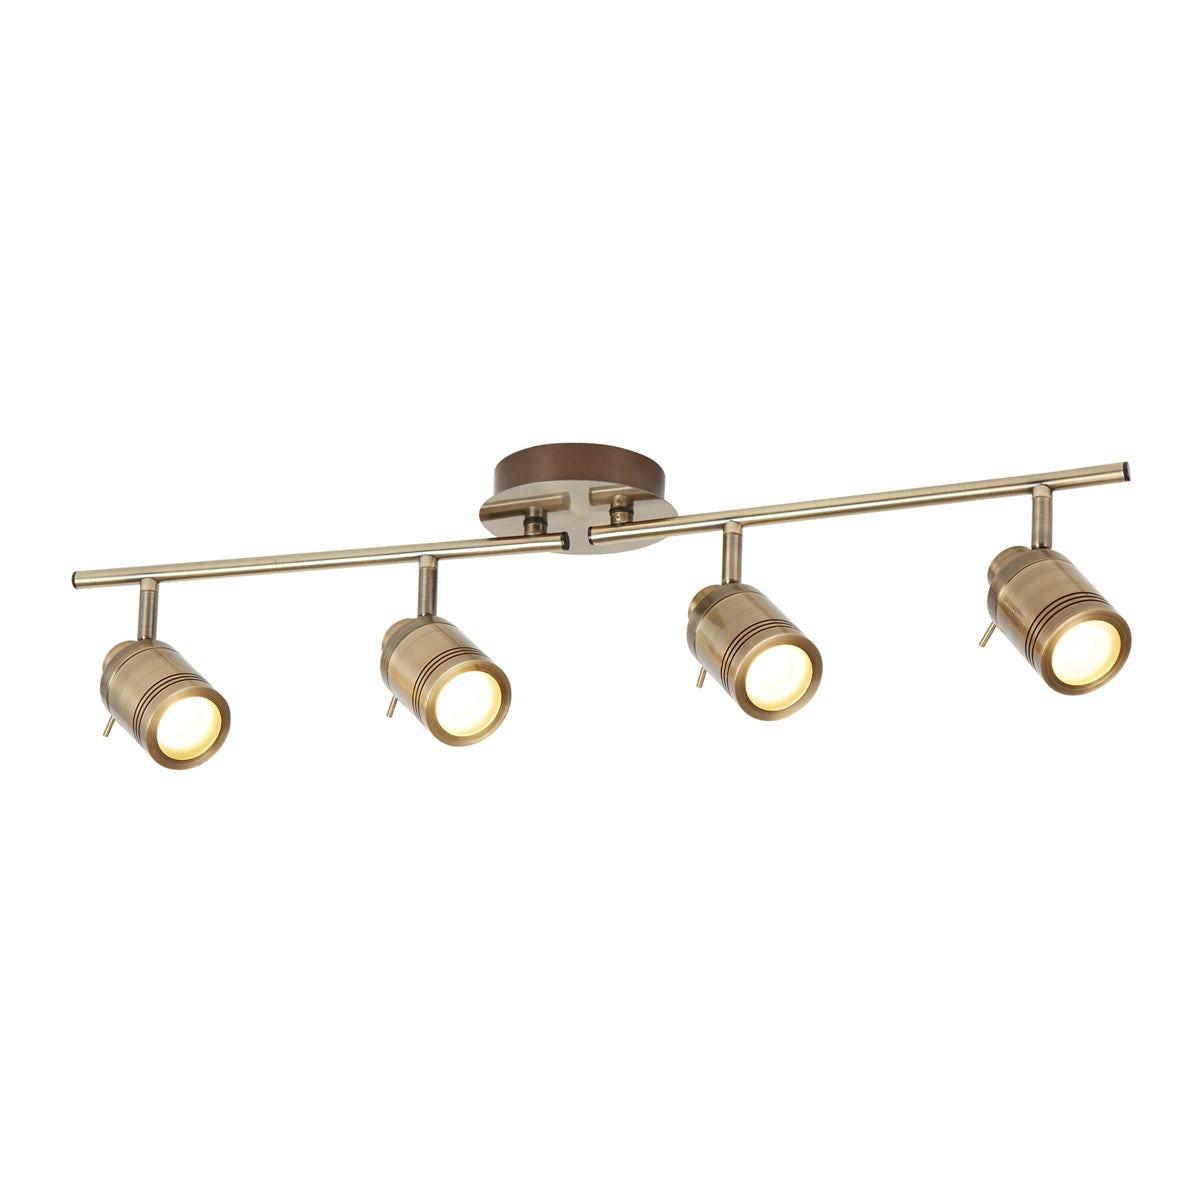 Searchlight Samson antique brass 4 light bathroom ceiling light